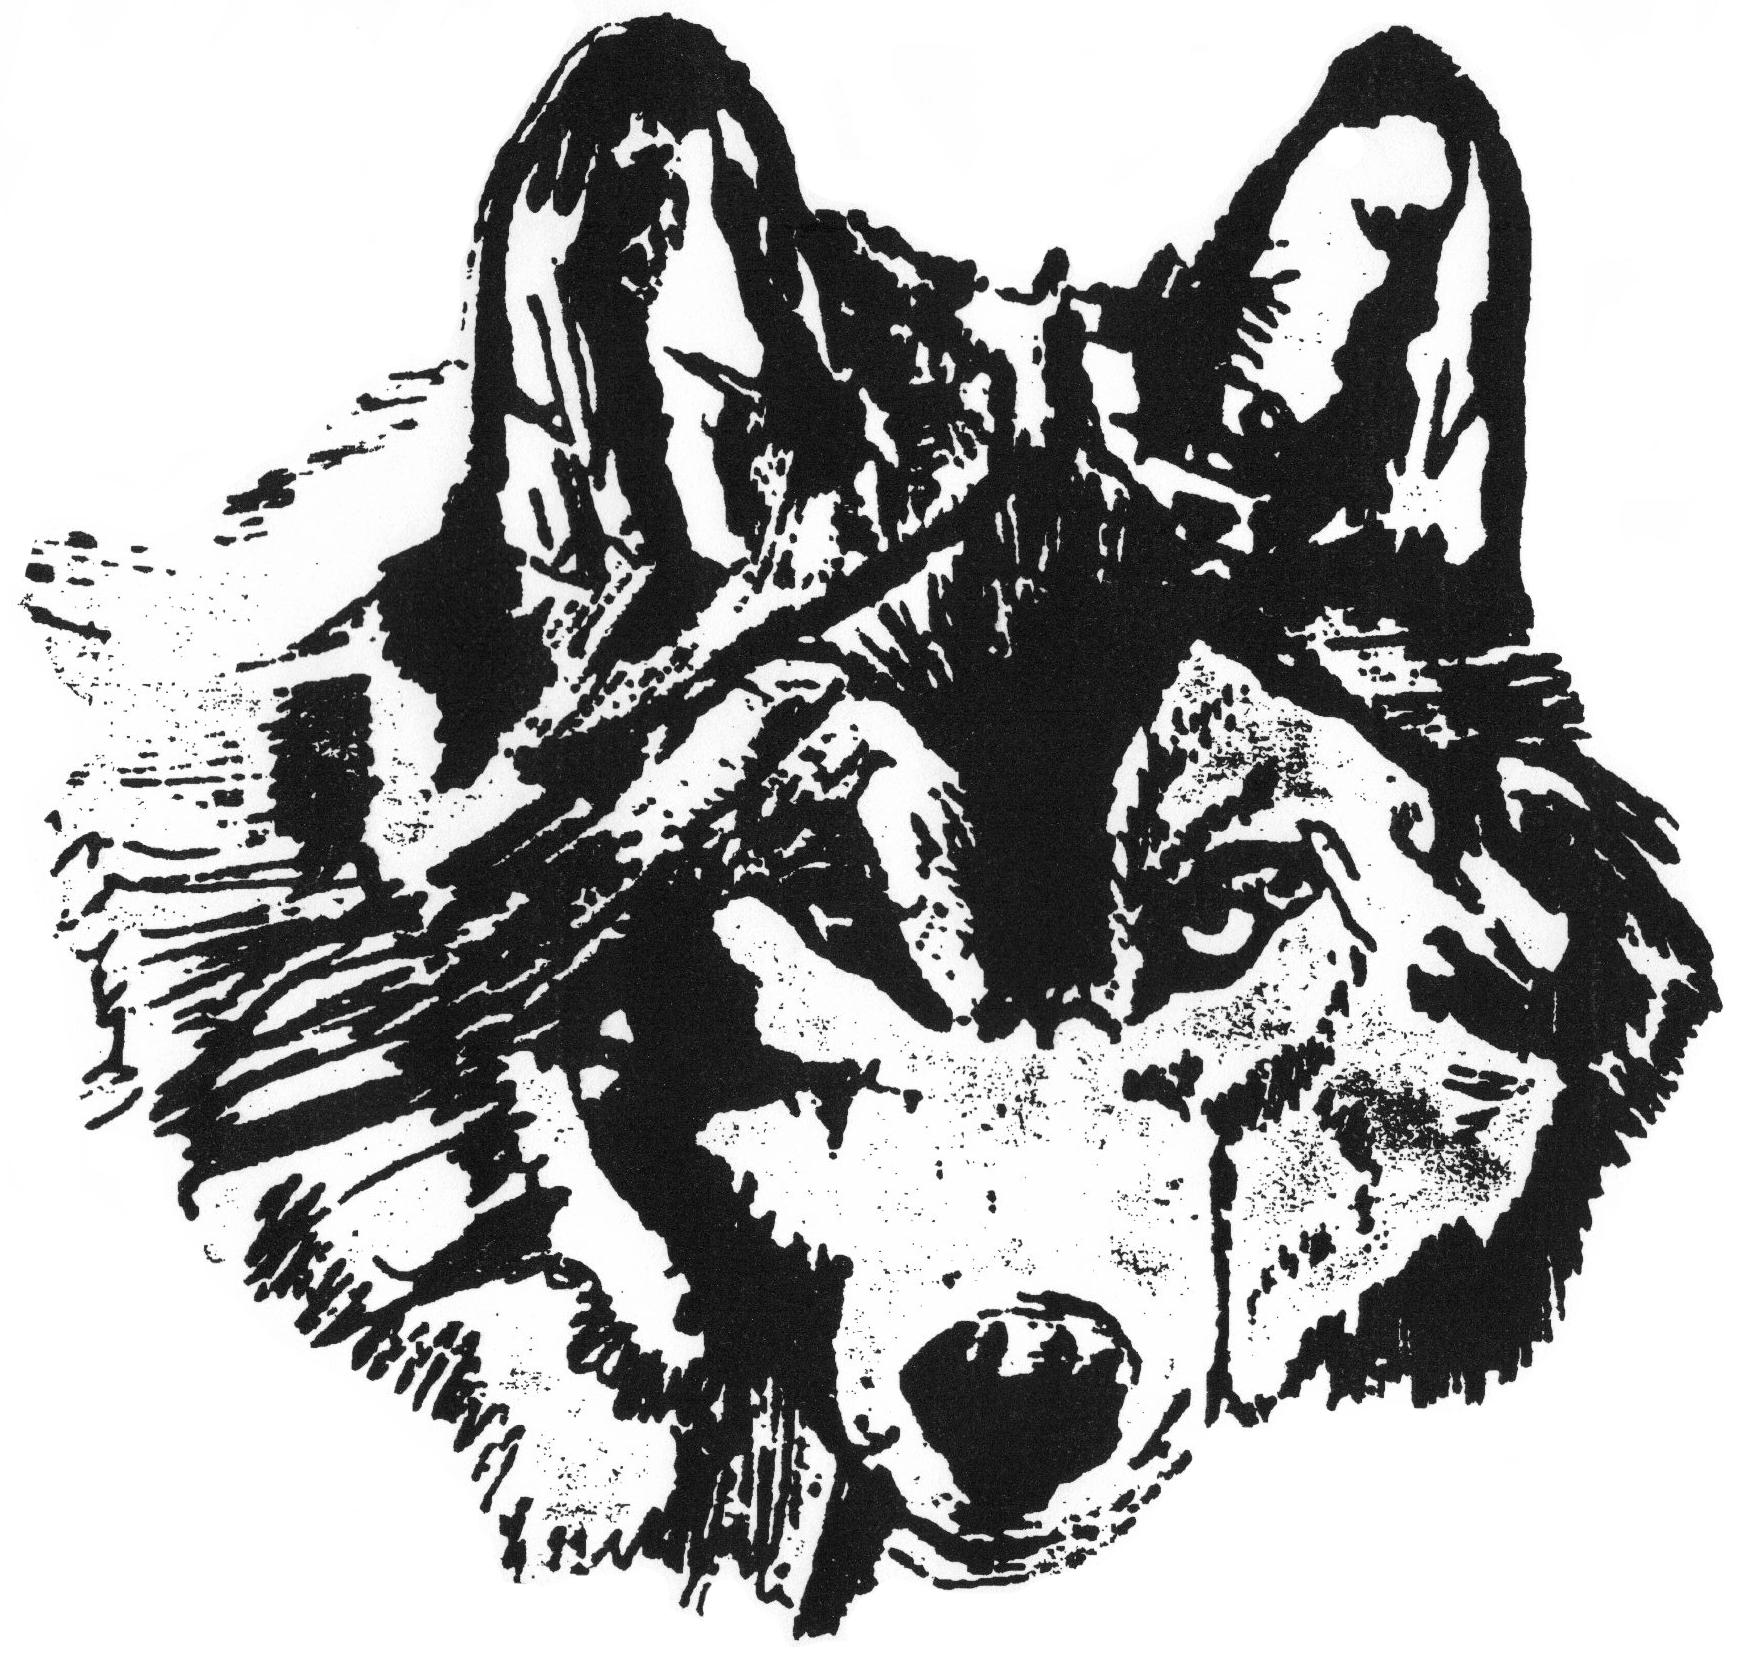 wolf mascot by greg manwaring